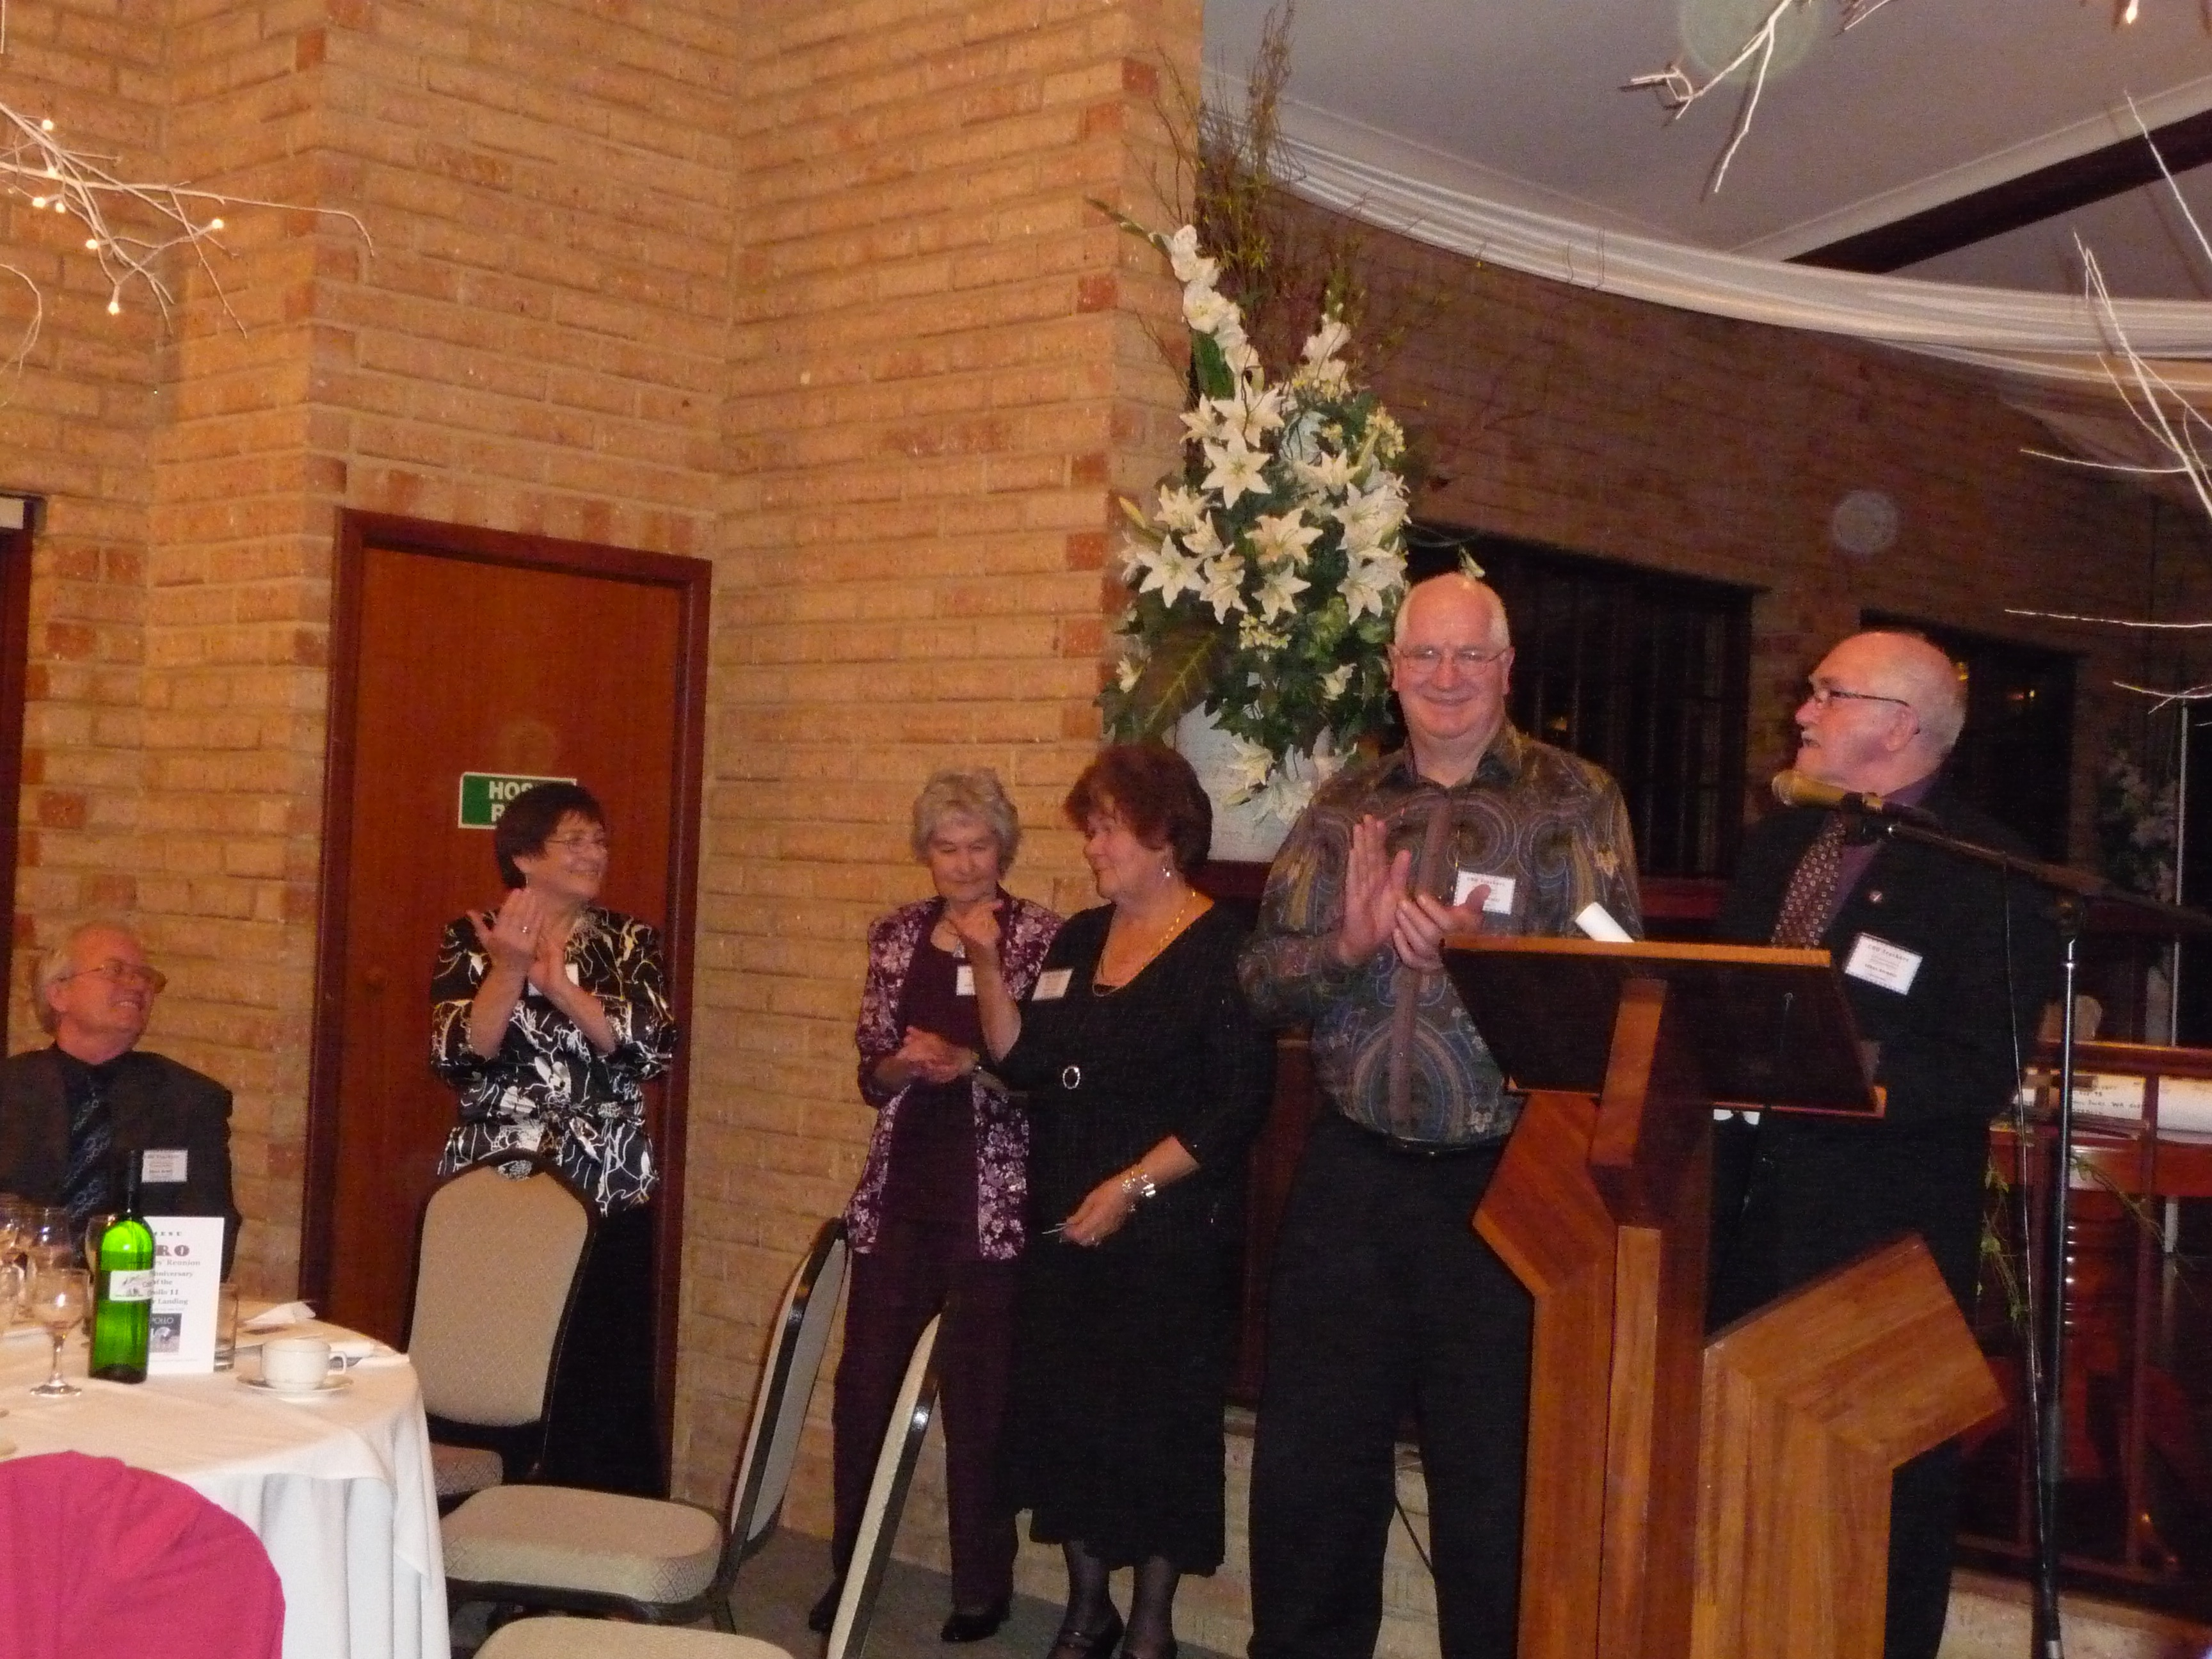 Lesley Boulton, Barbara Mitchell, Barbara King, Trevor Housley, Terry Kierans